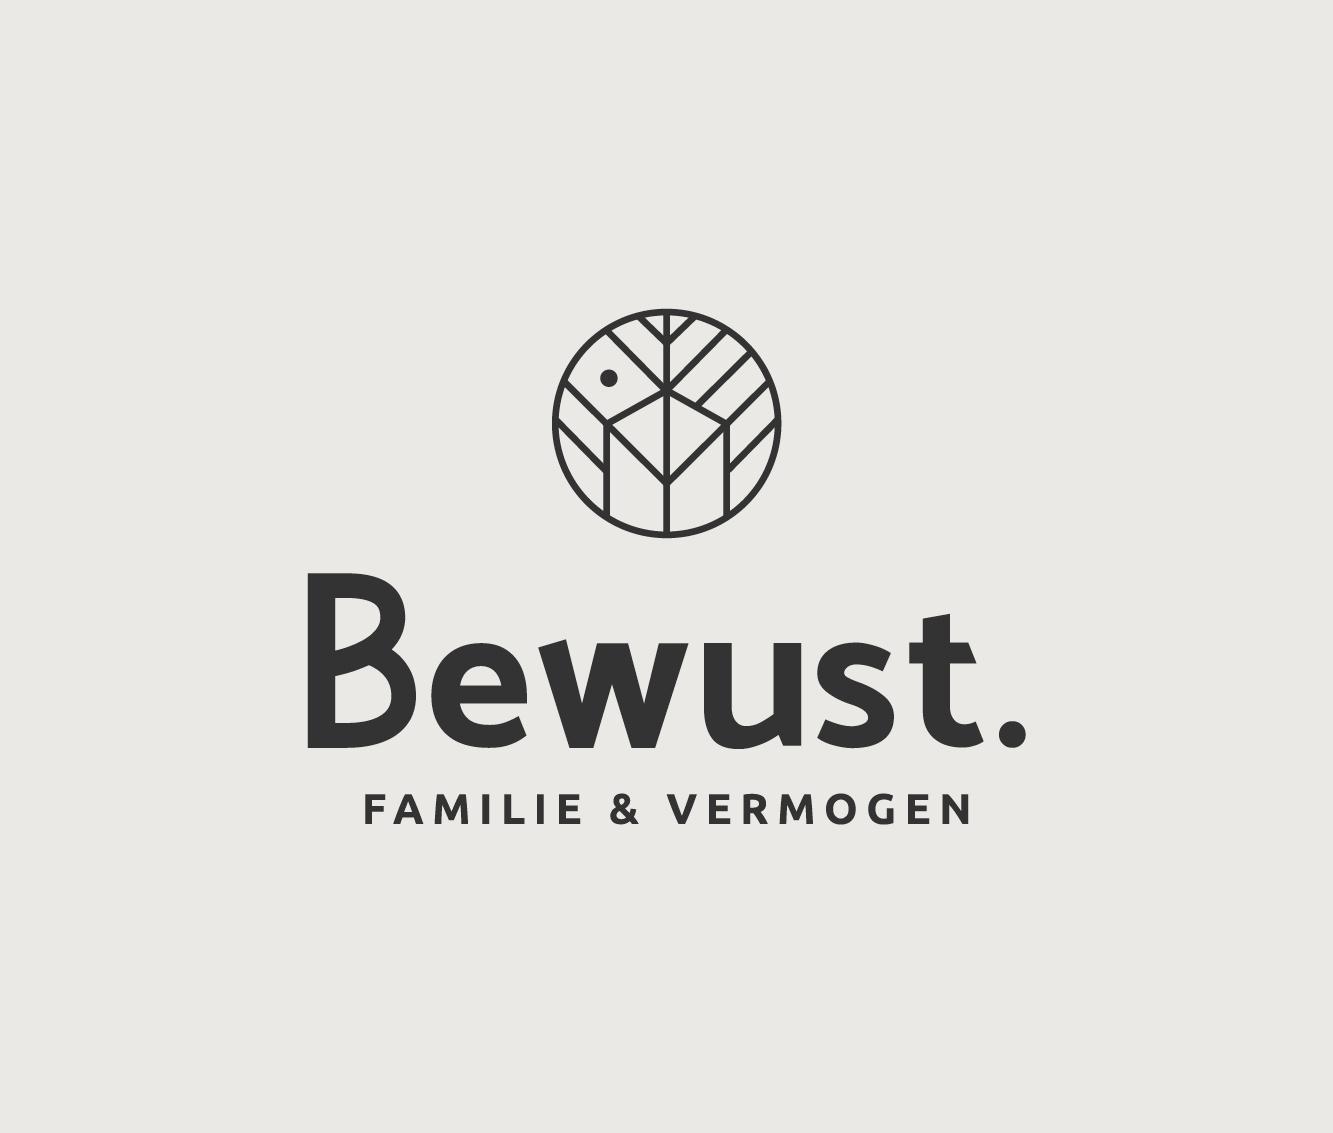 Studio Marly - Creative Agency - Bewust. Familie & Vermogen